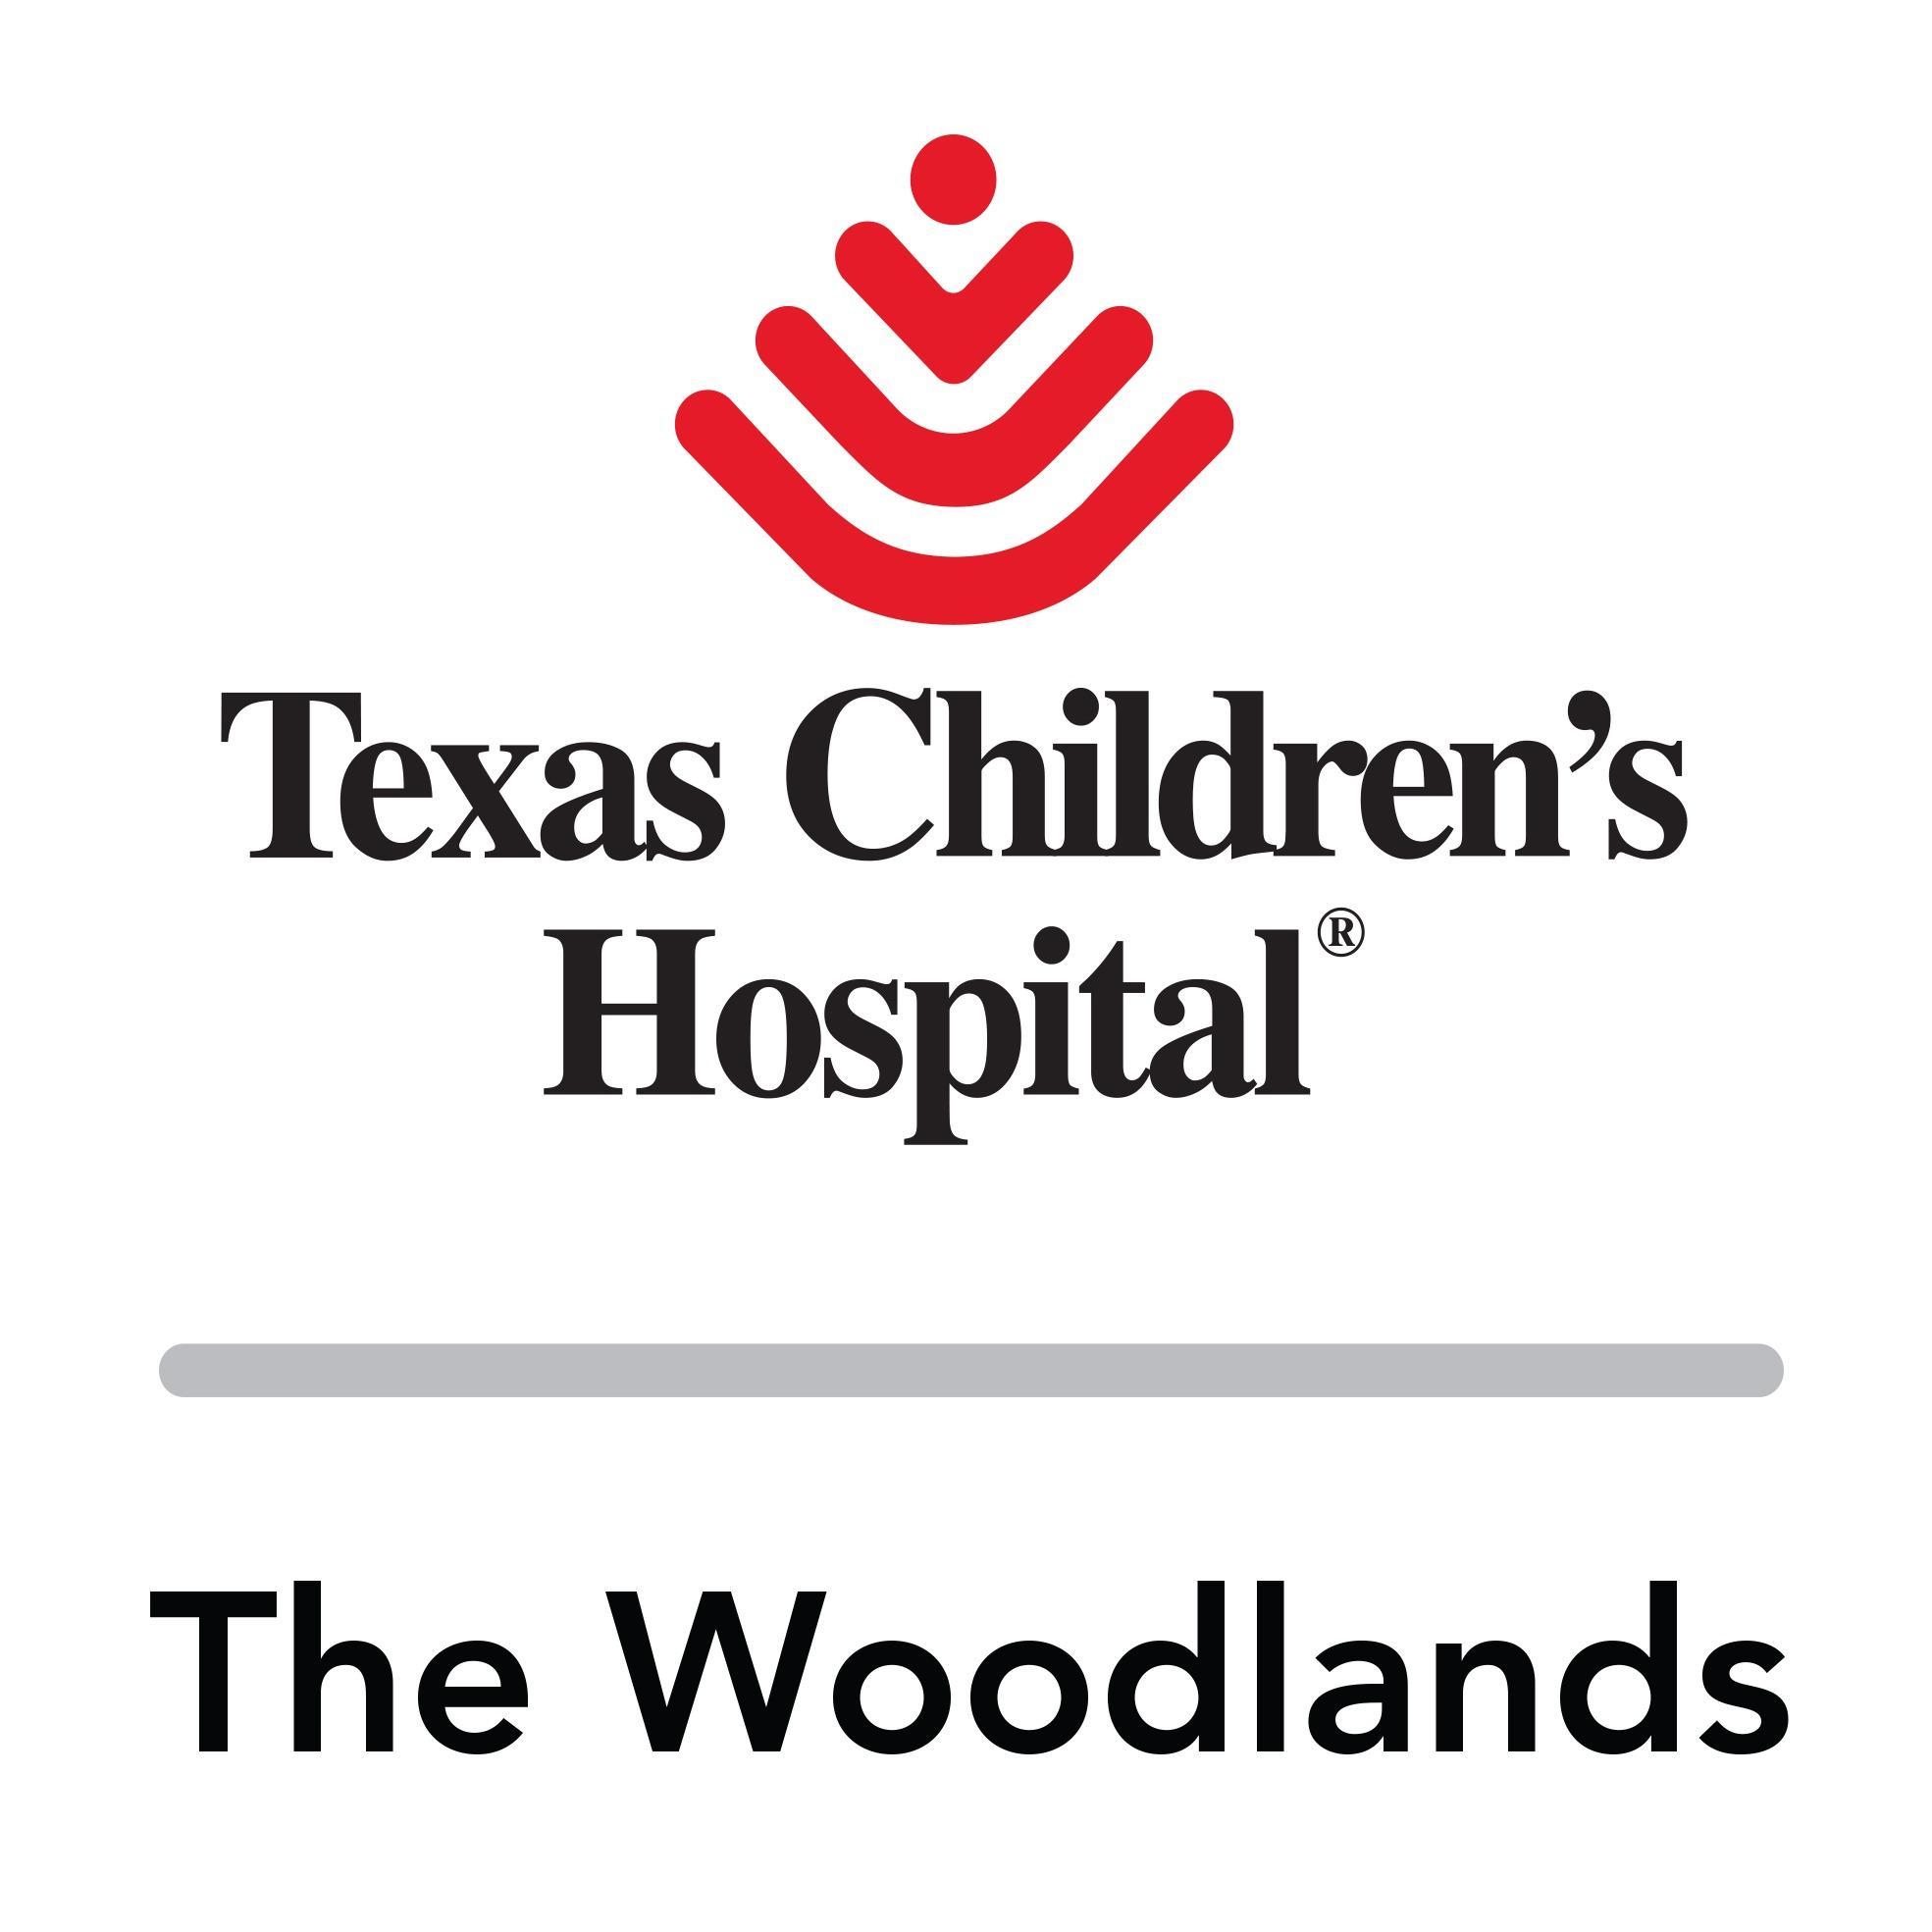 Texas Children's Hospital The Woodlands - Outpatient Services